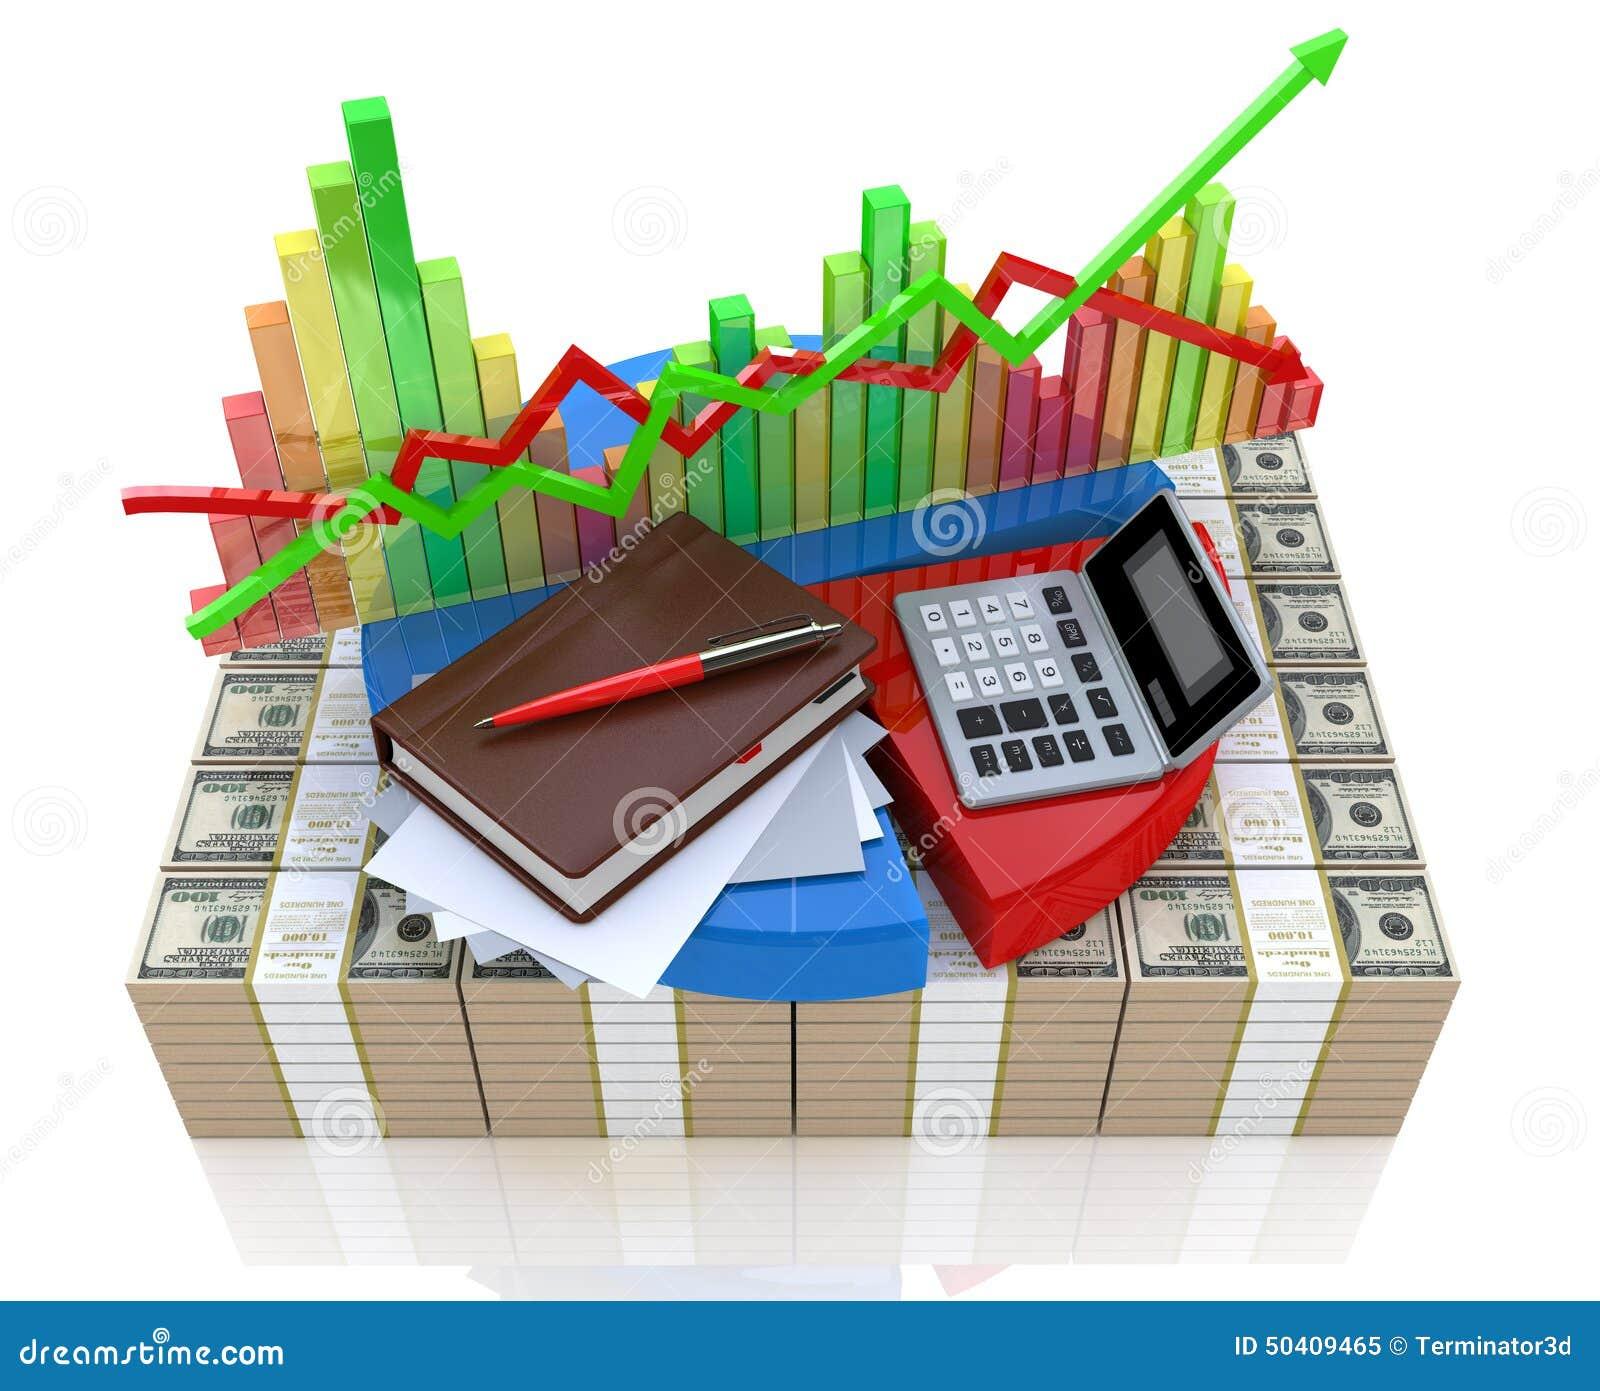 Cálculo de negócio - análise do mercado financeiro